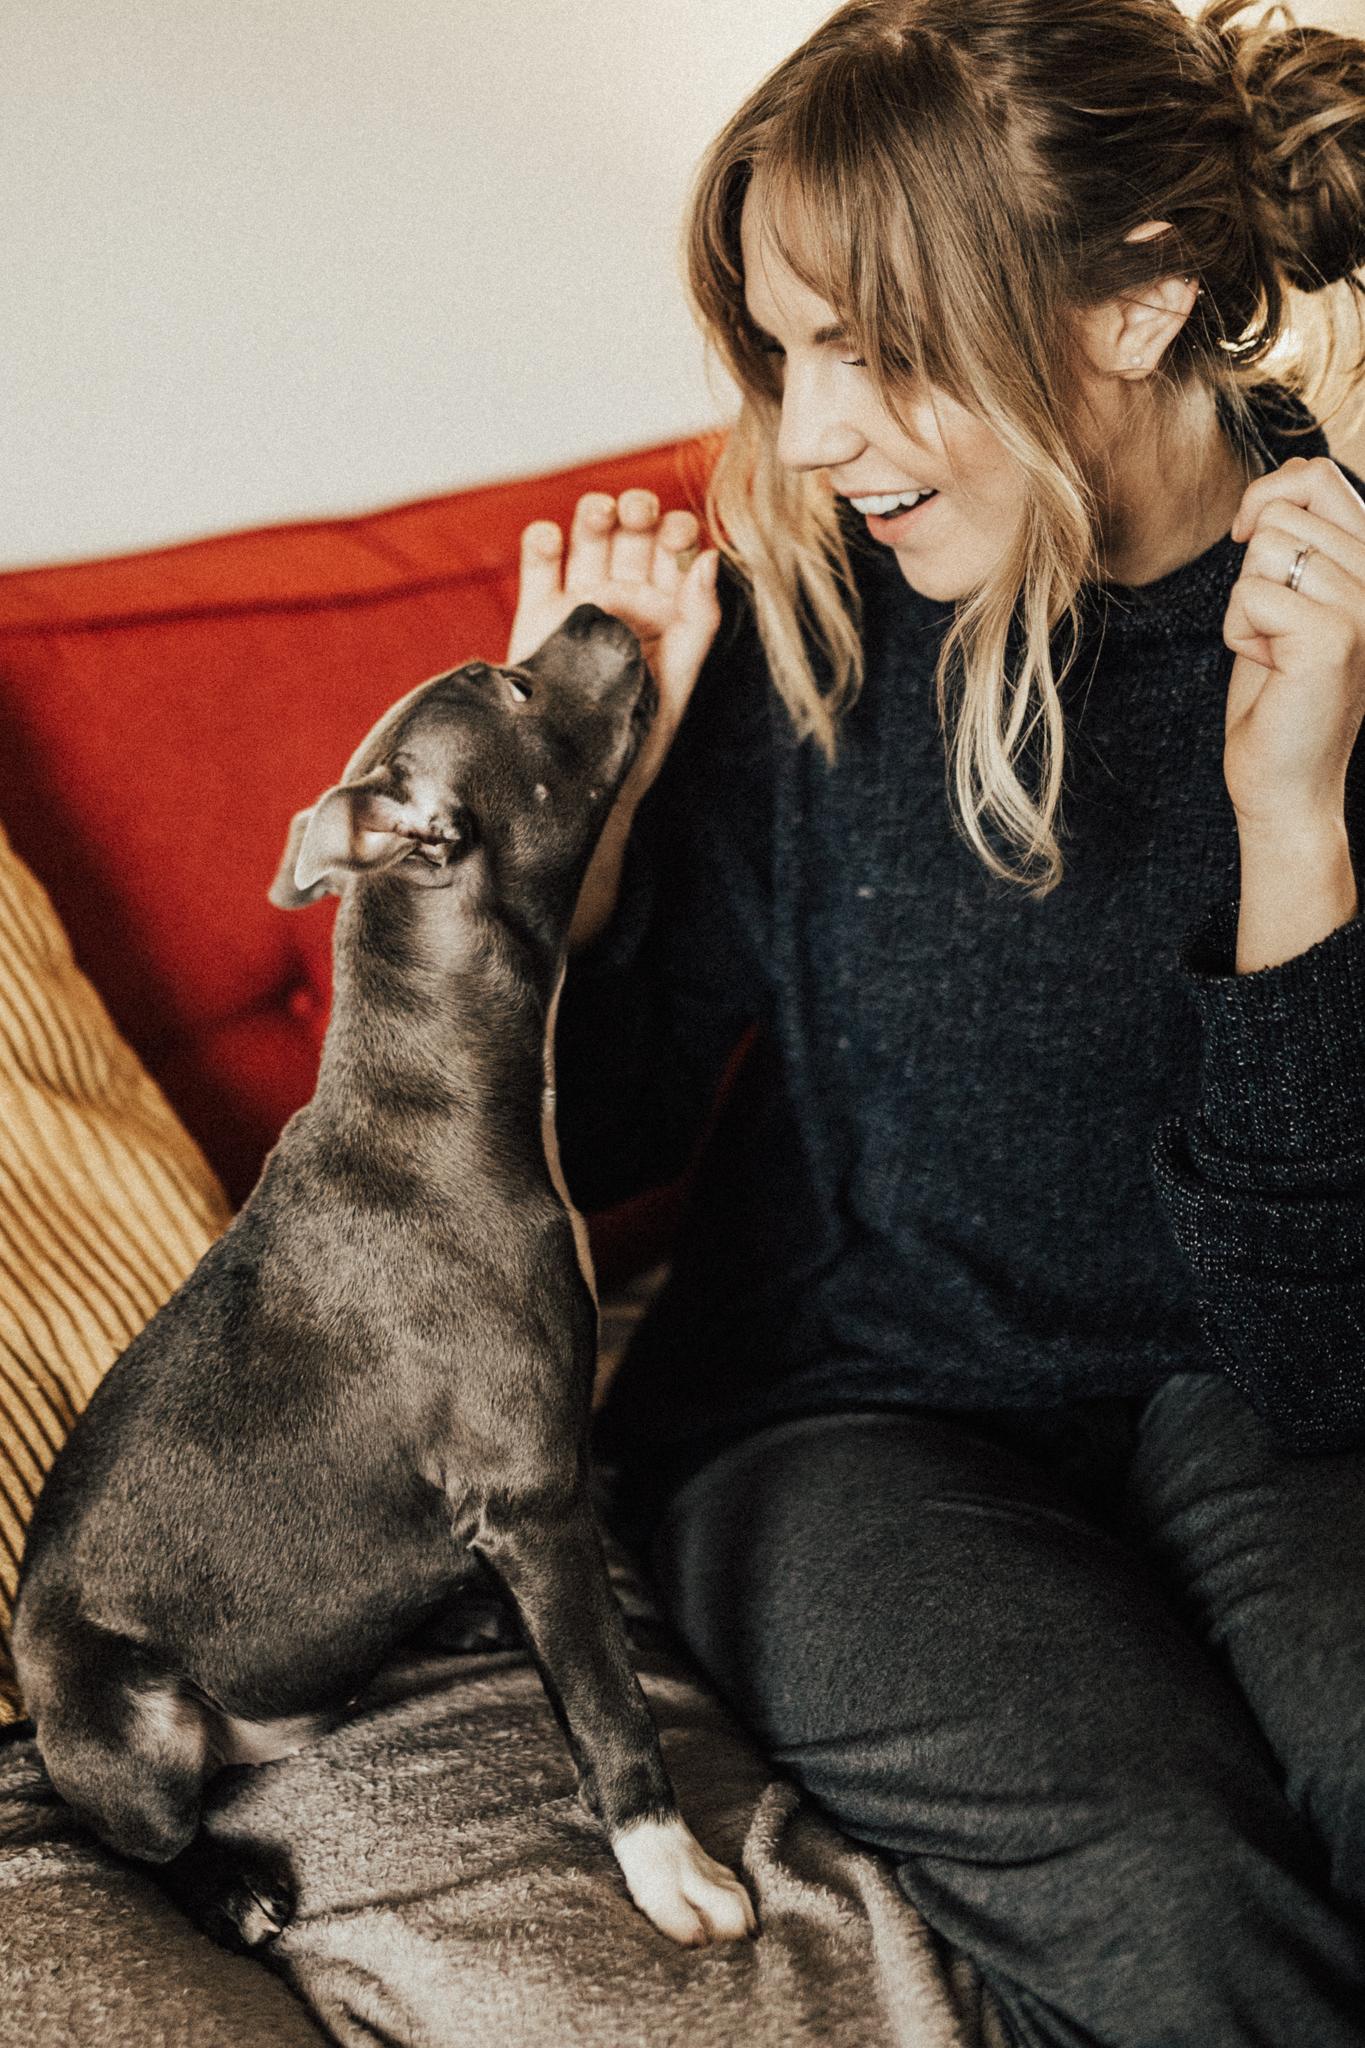 Dog-Human-Session-Photography-Darina-Stoda-Animal-Indigo-7.jpg